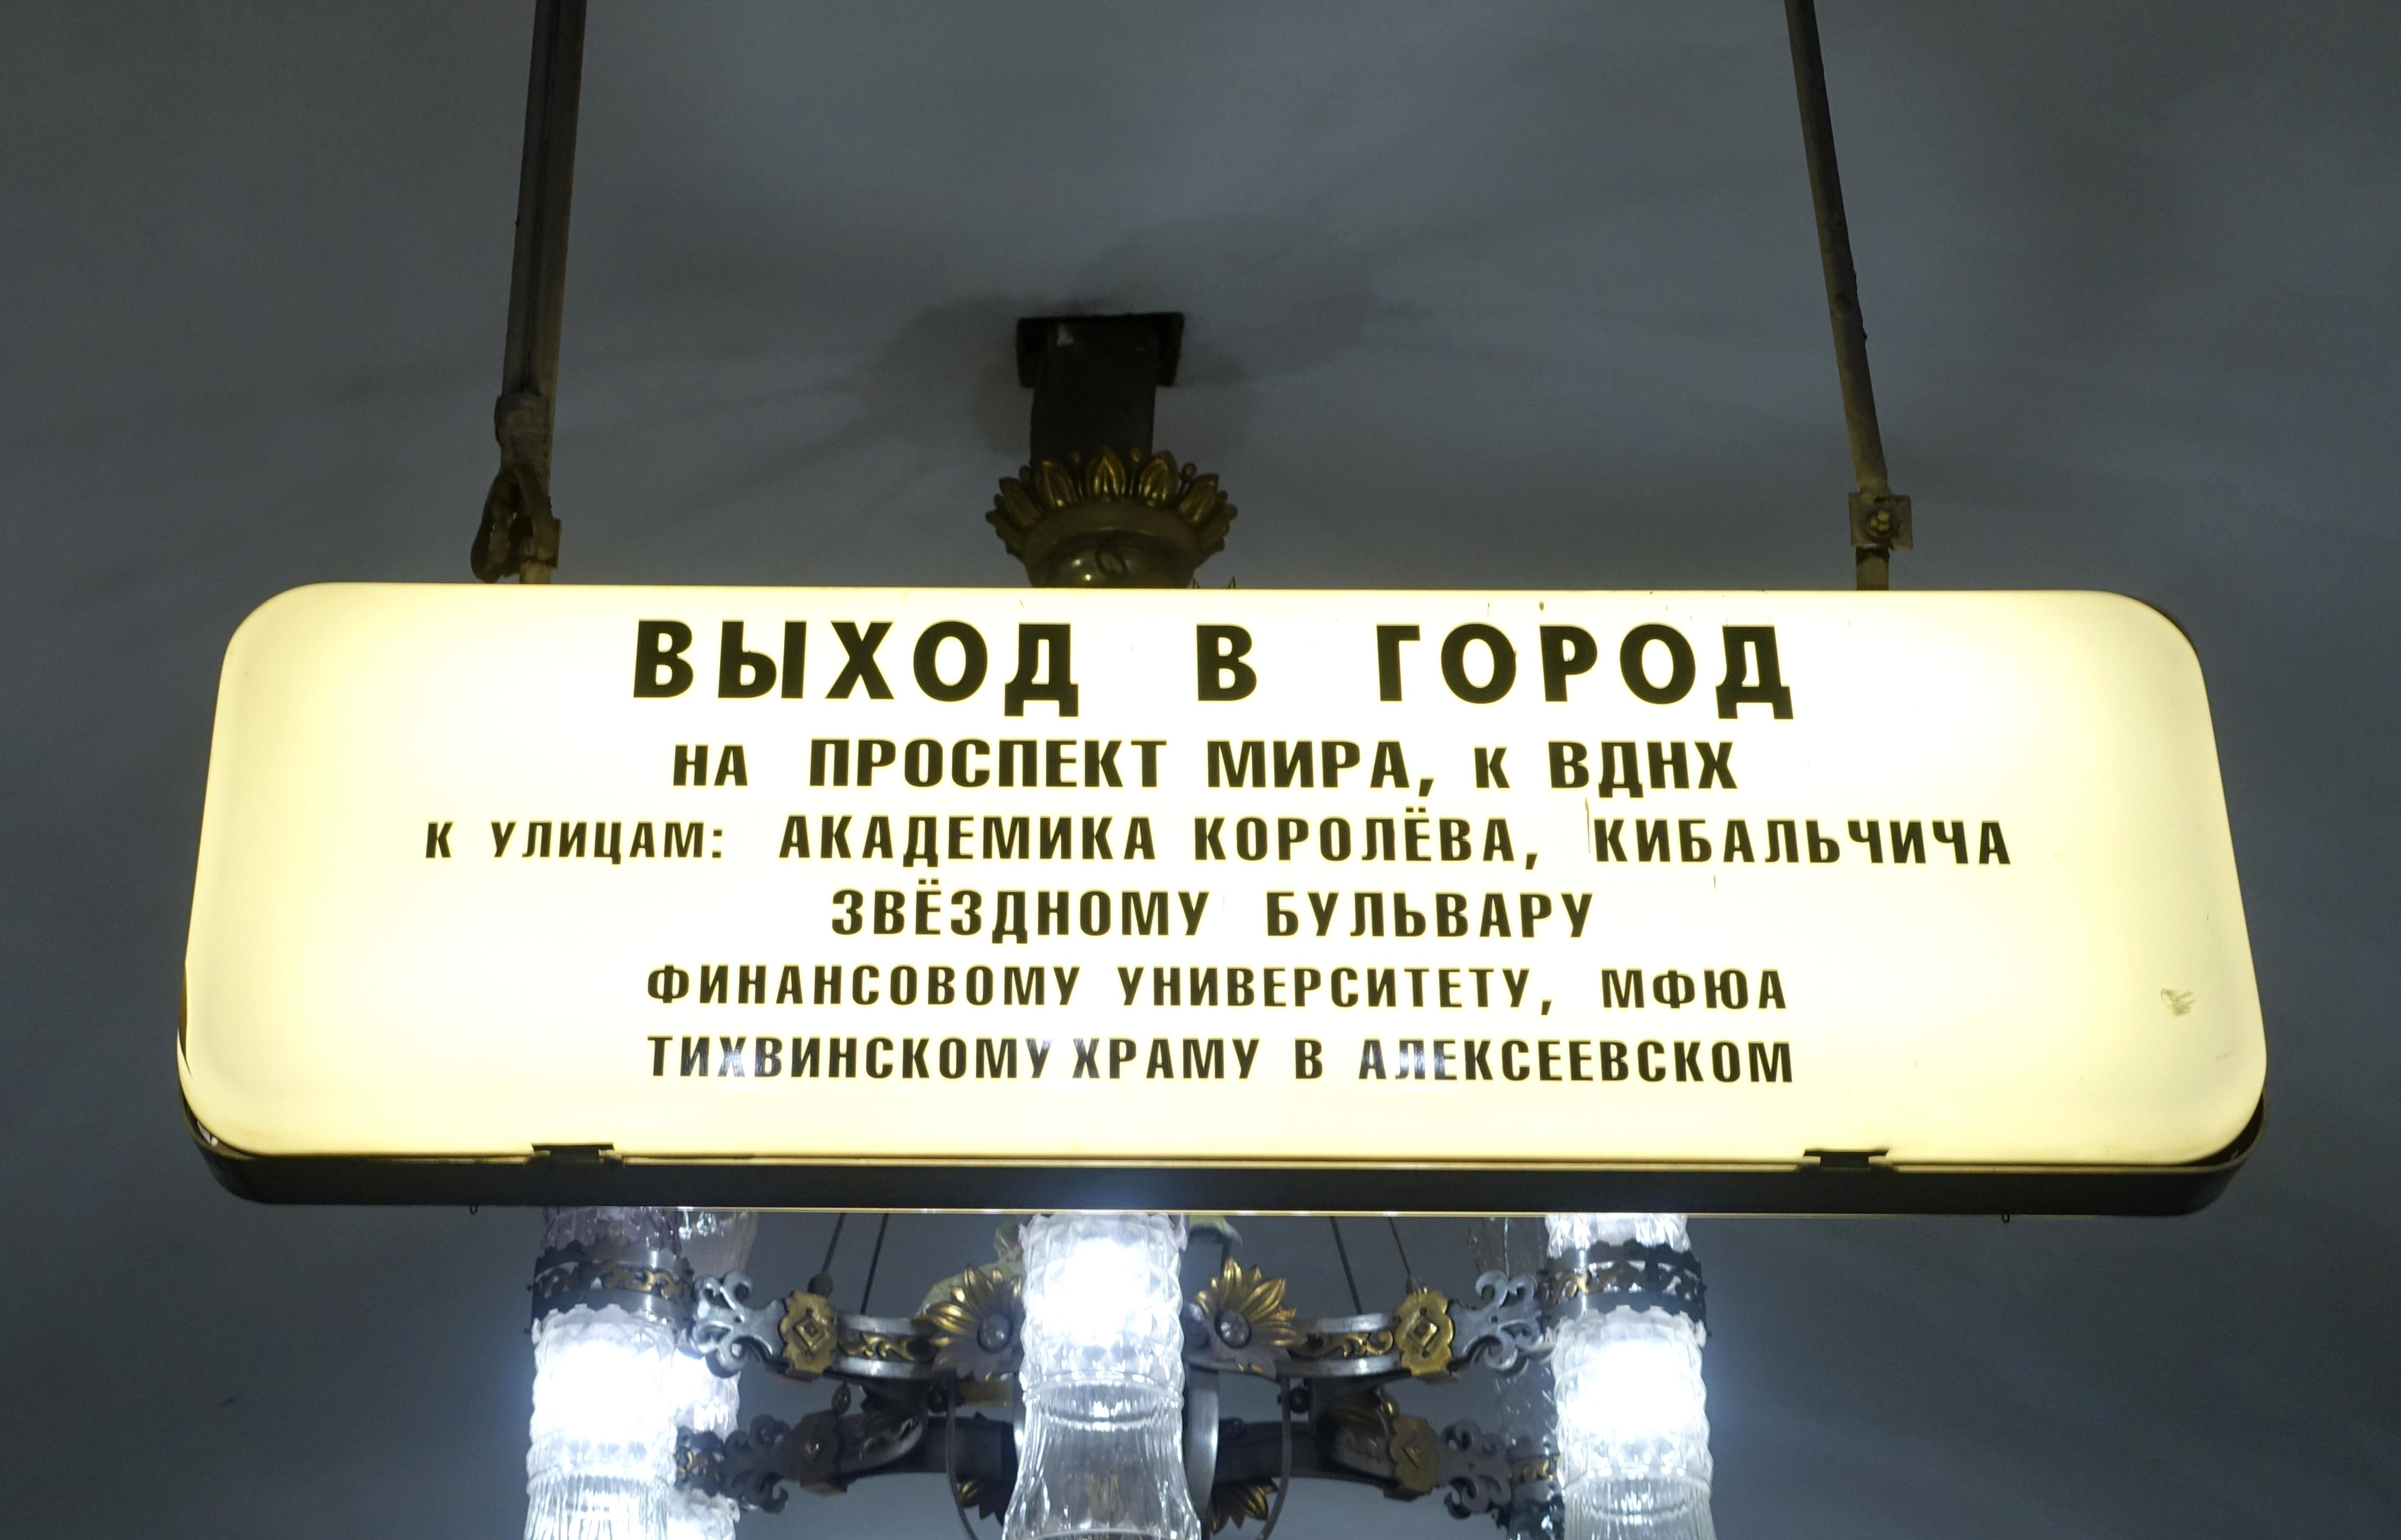 VDNKh Metro Station Exit Sign